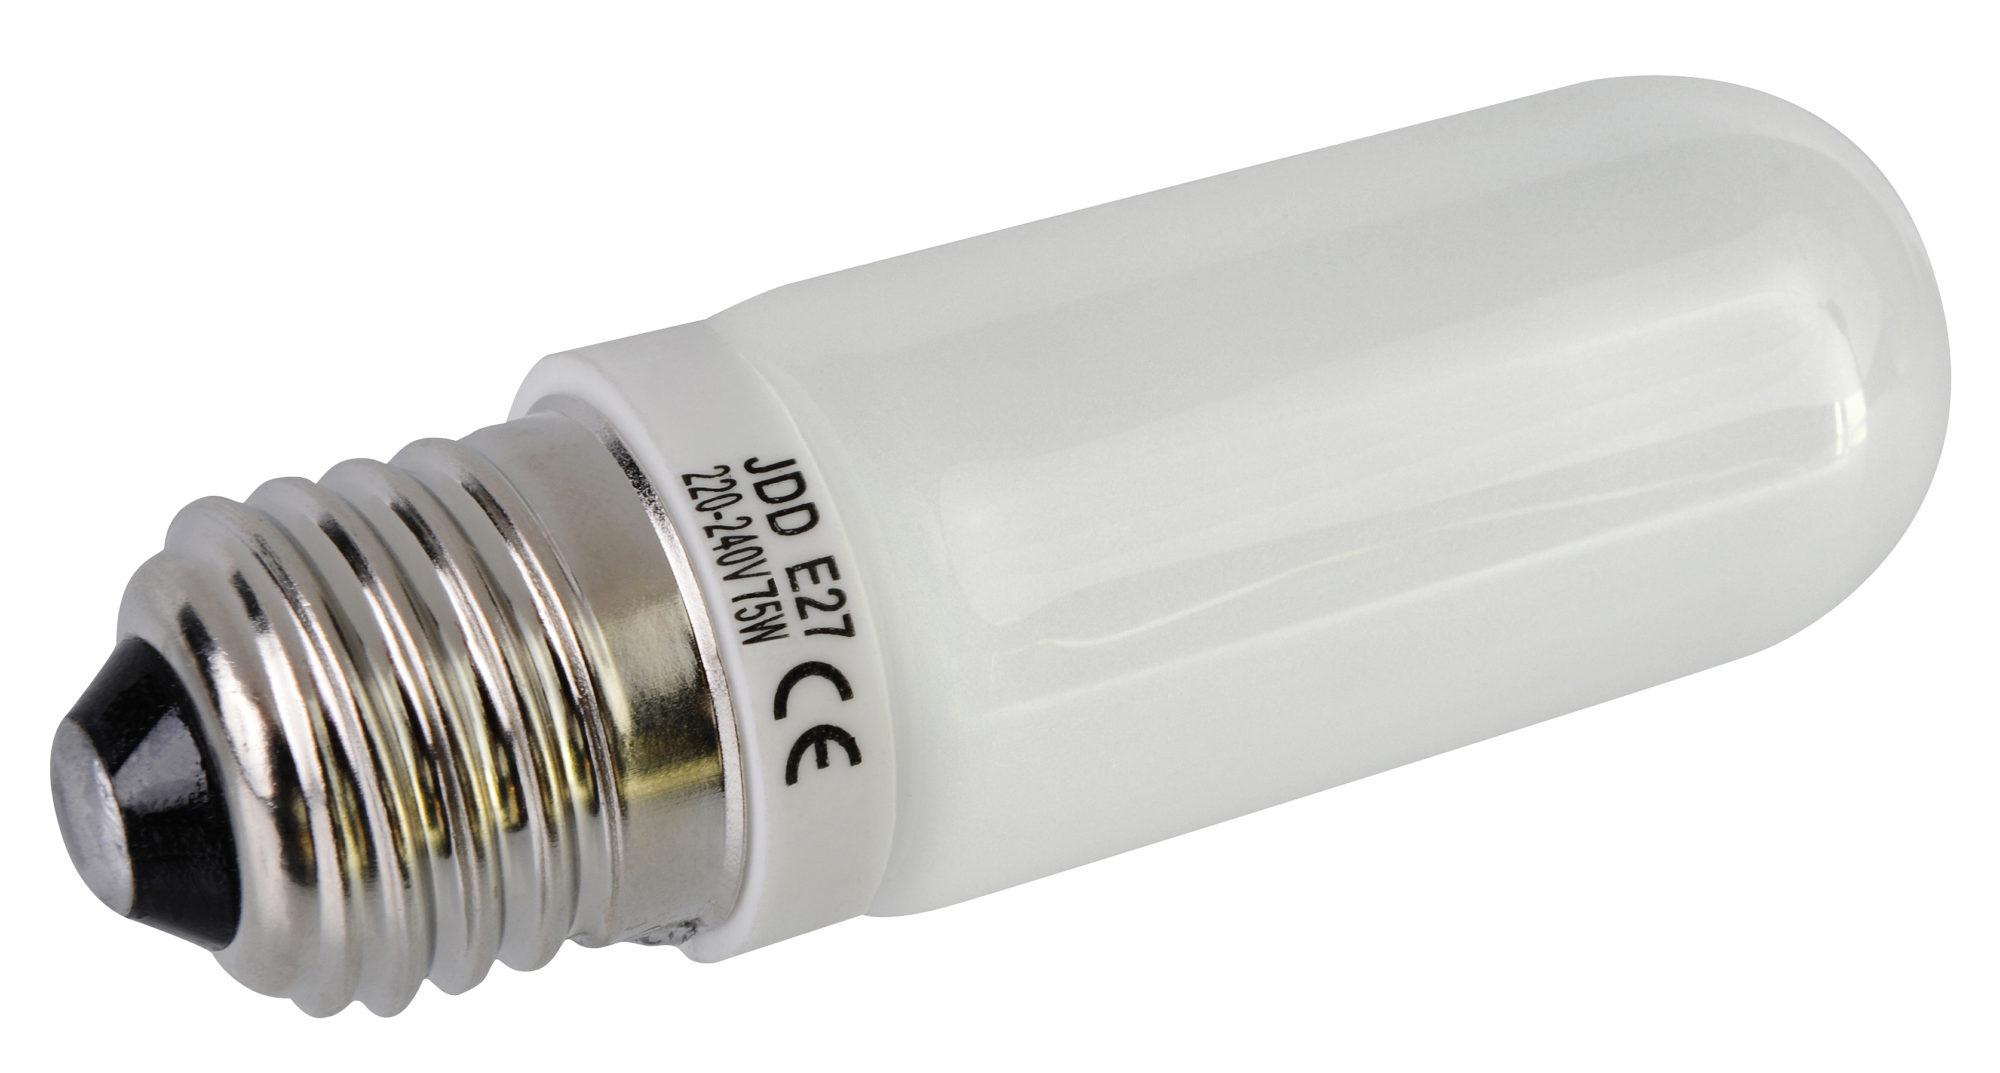 bresser jdd 5 ampoule halog ne pour lampe pilote e27 75w. Black Bedroom Furniture Sets. Home Design Ideas